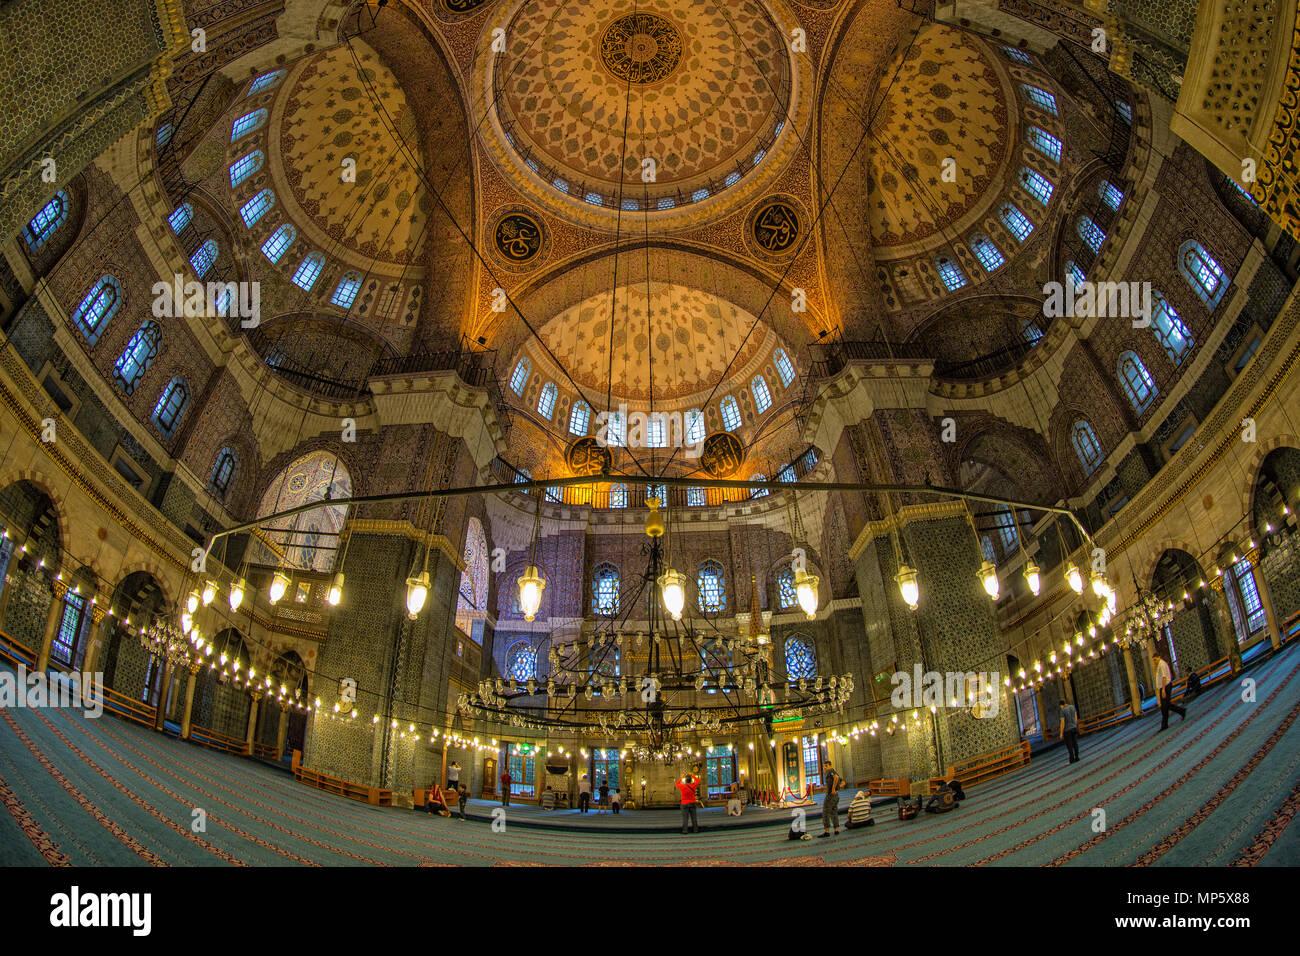 Istanbu - Blue Mosque, Sultan Ahmed Mosque. Blaue Moschee. Sultan-Ahmed-Moschee. - Stock Image